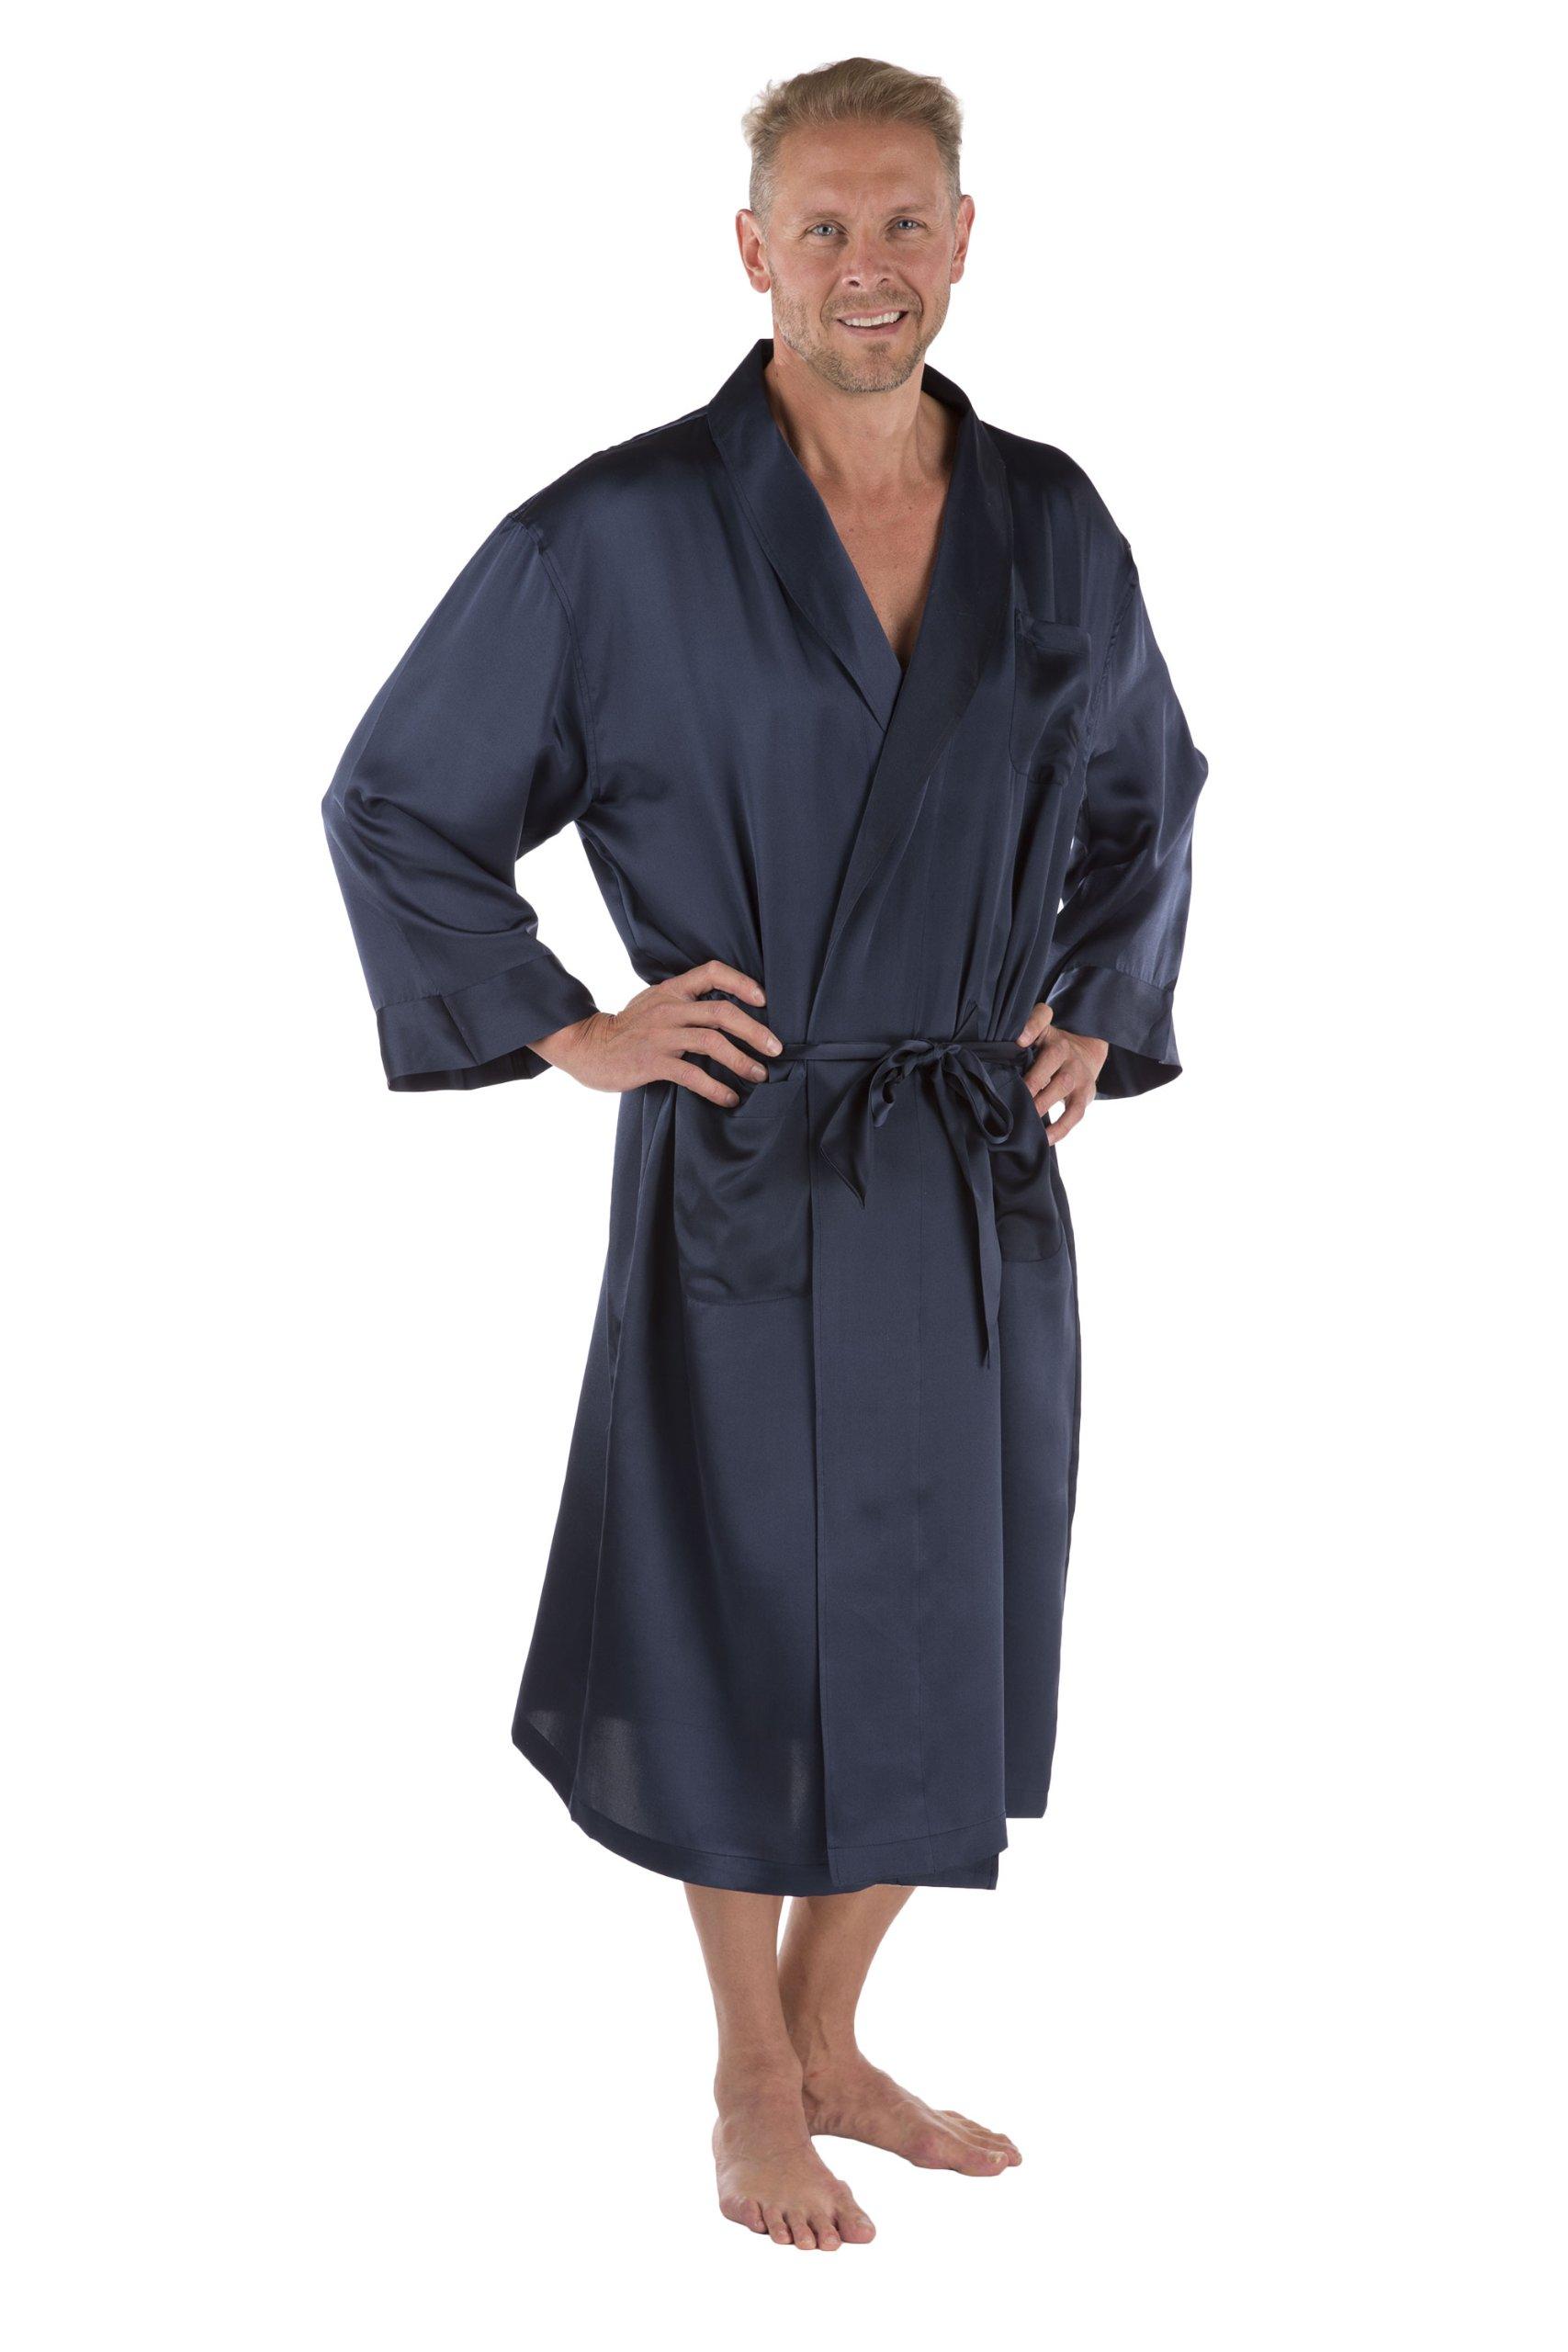 Texeresilk Men's Silk Robe - Luxury Bathrobe for Men - Silk Bathrobe for Him (Midnight Blue, Large/X-Large)